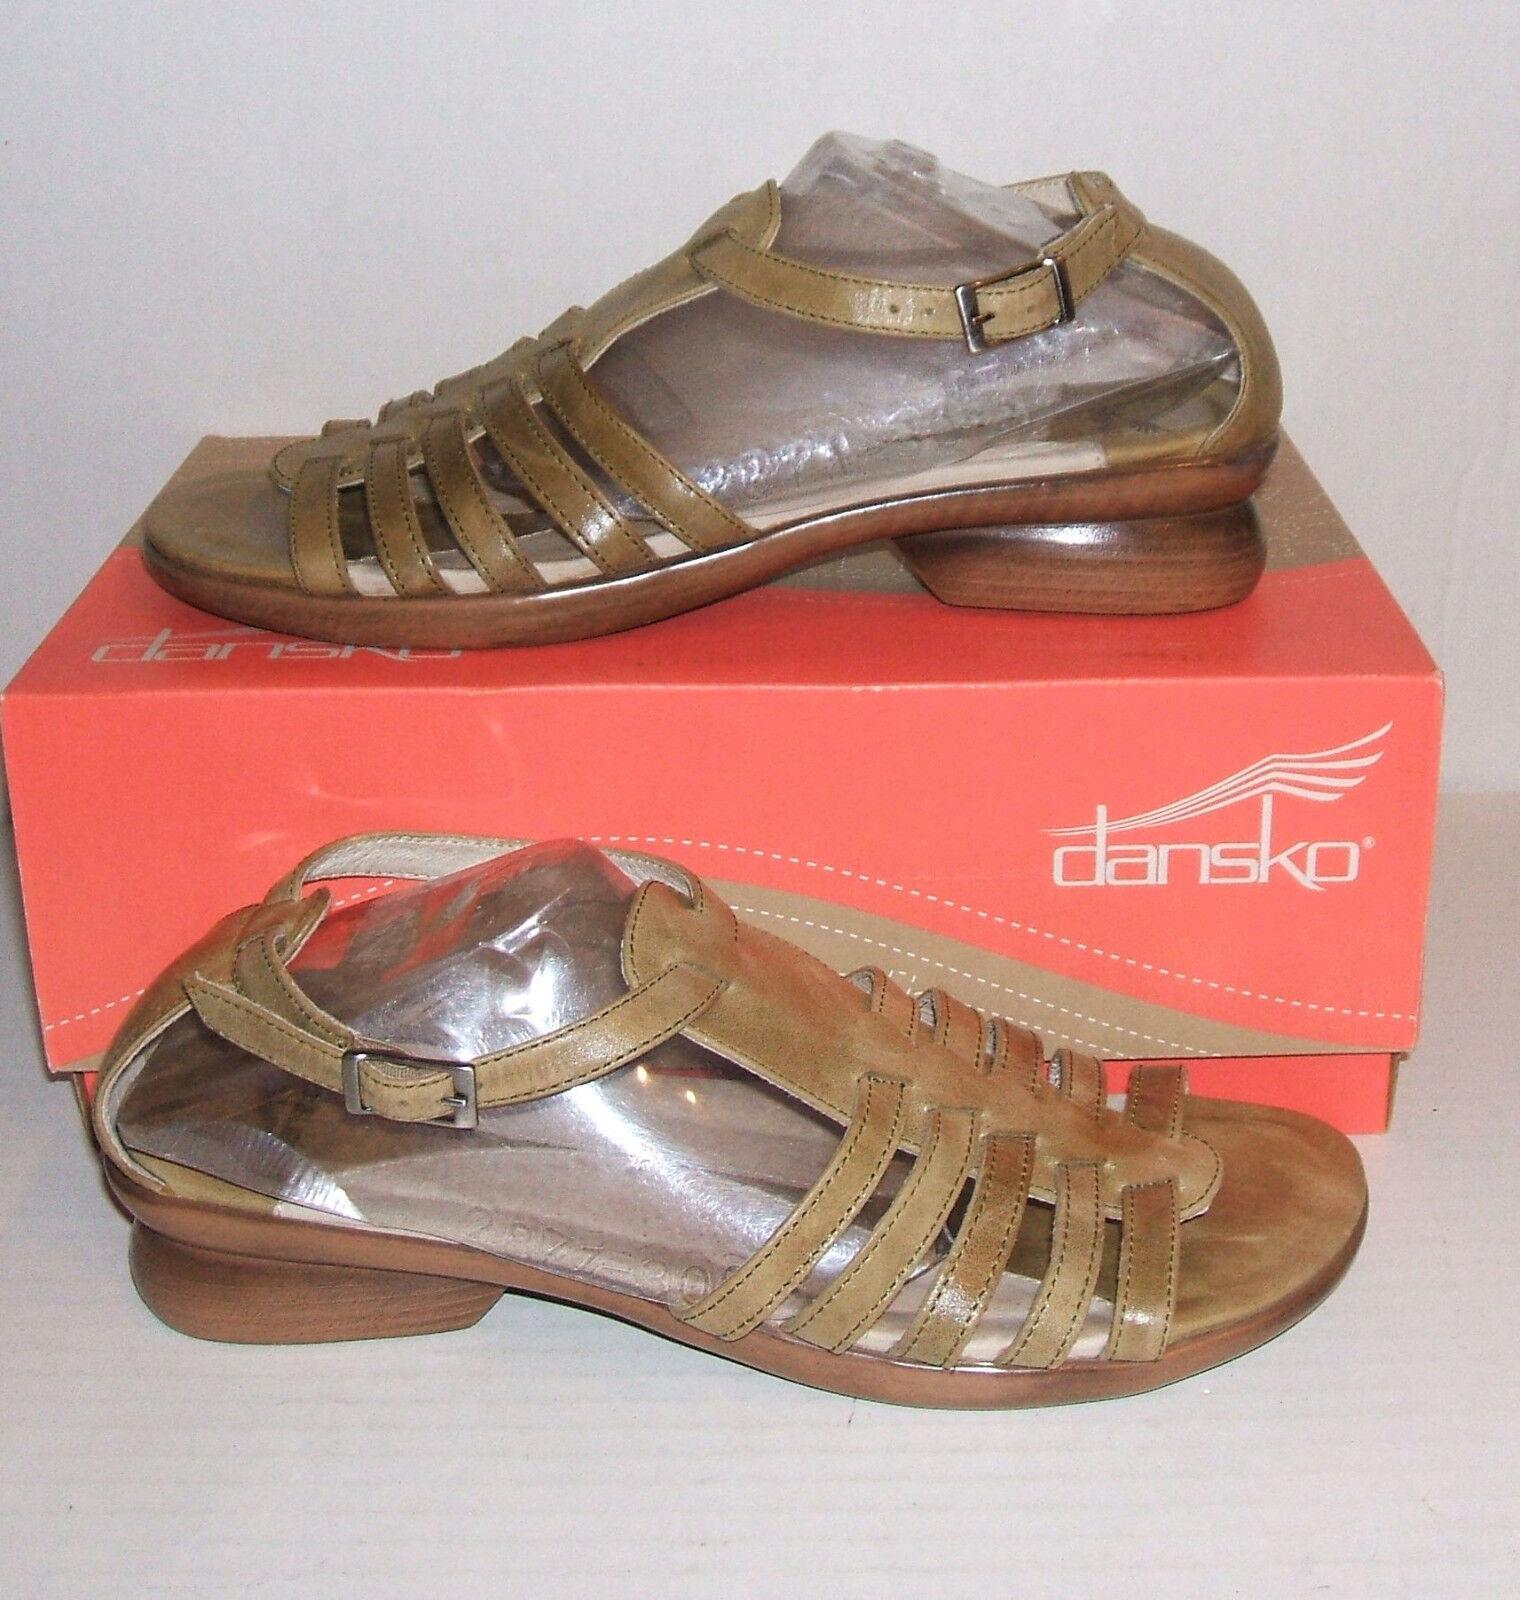 DANSKO Women's Olive Green Leather Low Heel Sandals shoes SZ. 39 EU   8.5 - 9 US